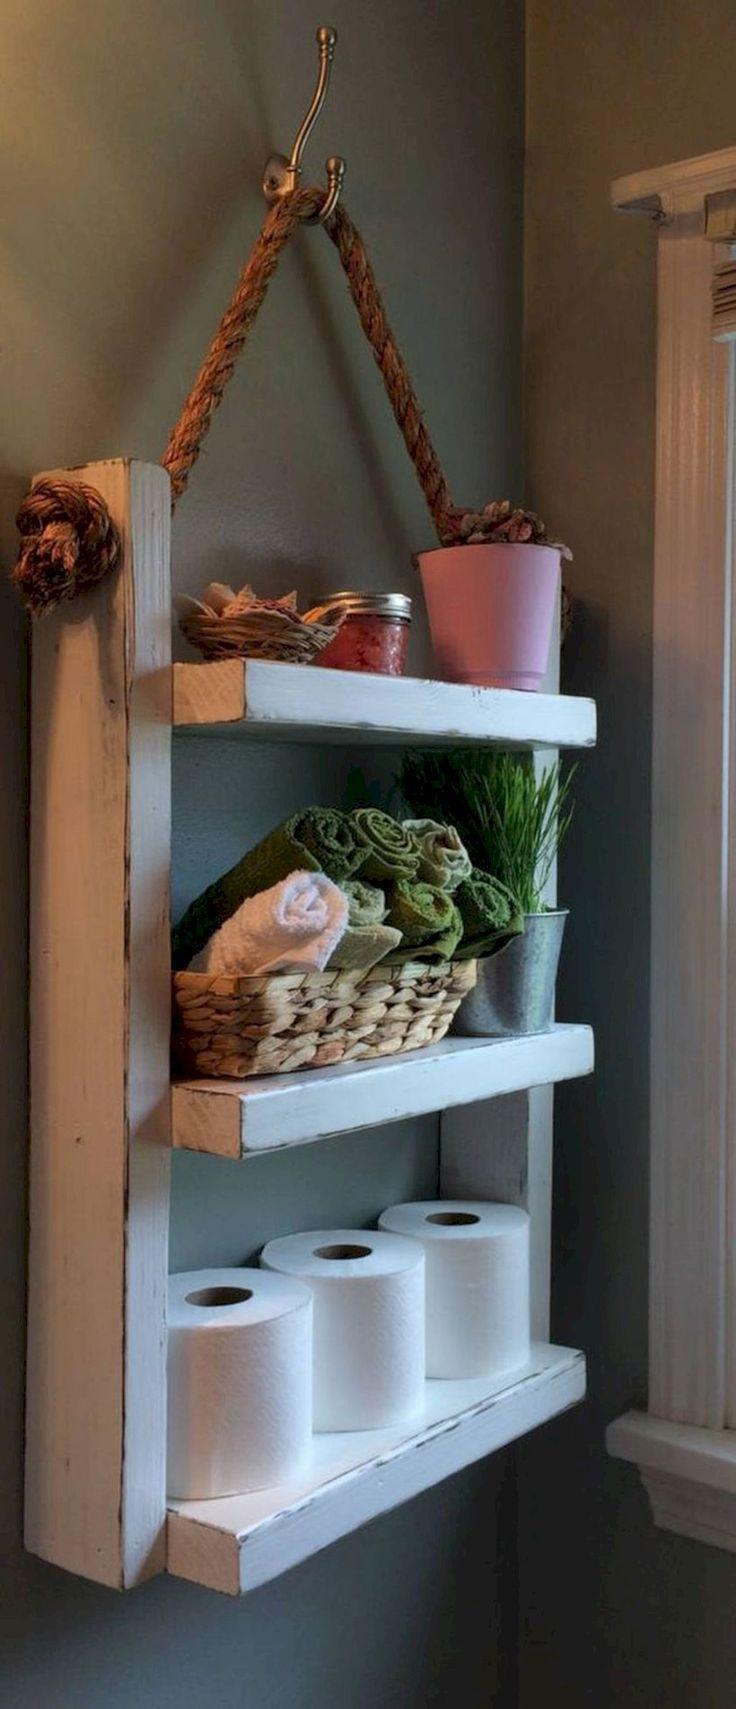 Best 25 Rustic Shelves Ideas On Pinterest Rustic Chic